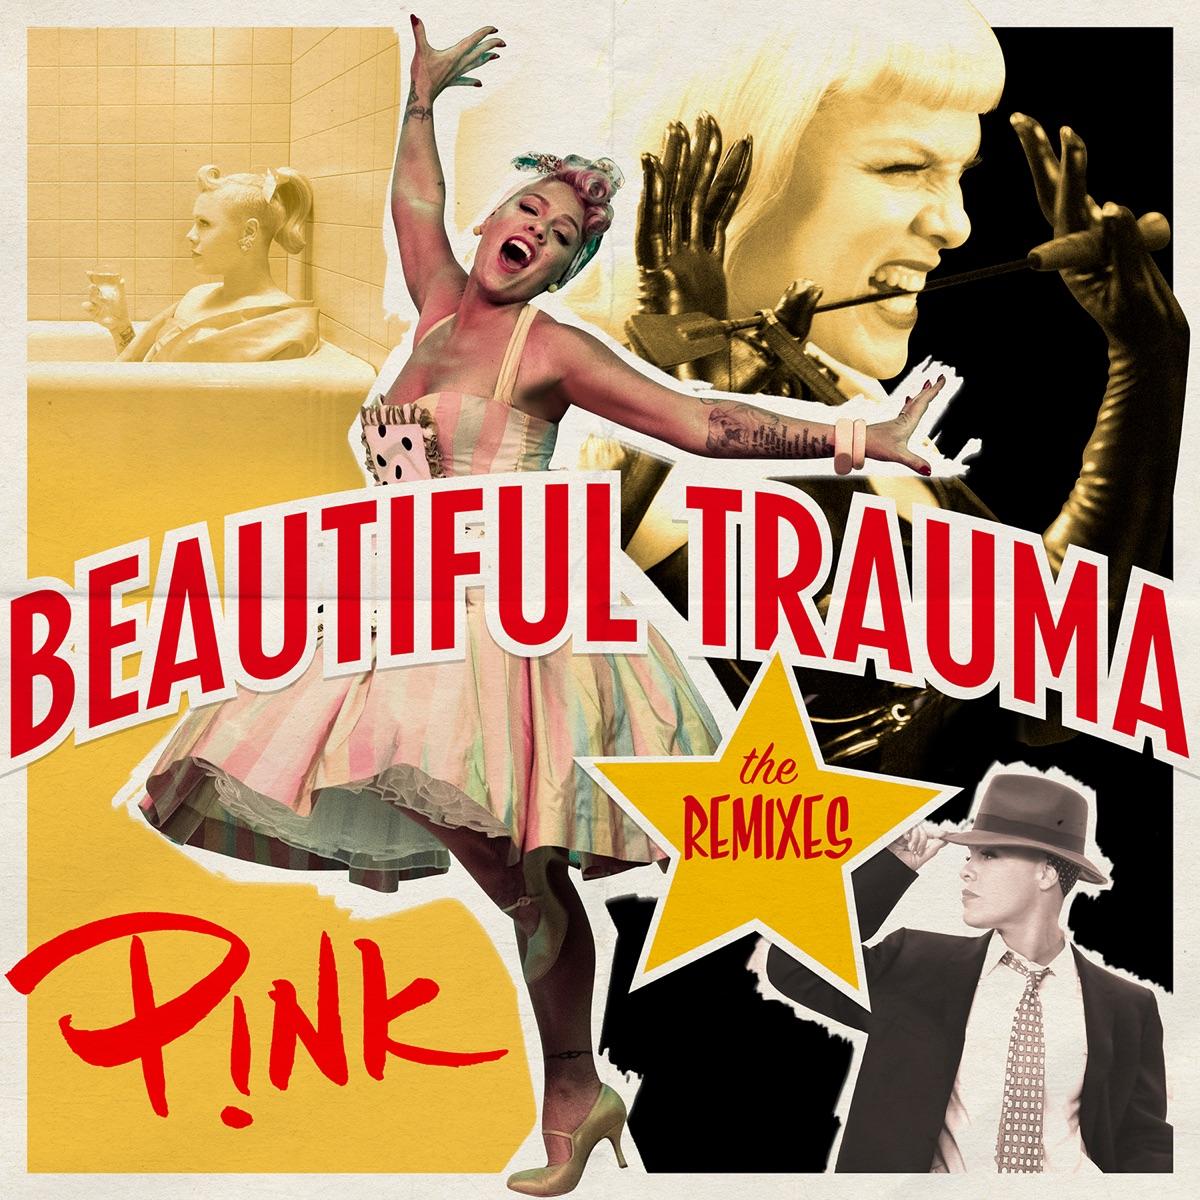 Beautiful Trauma The Remixes - EP Pnk CD cover